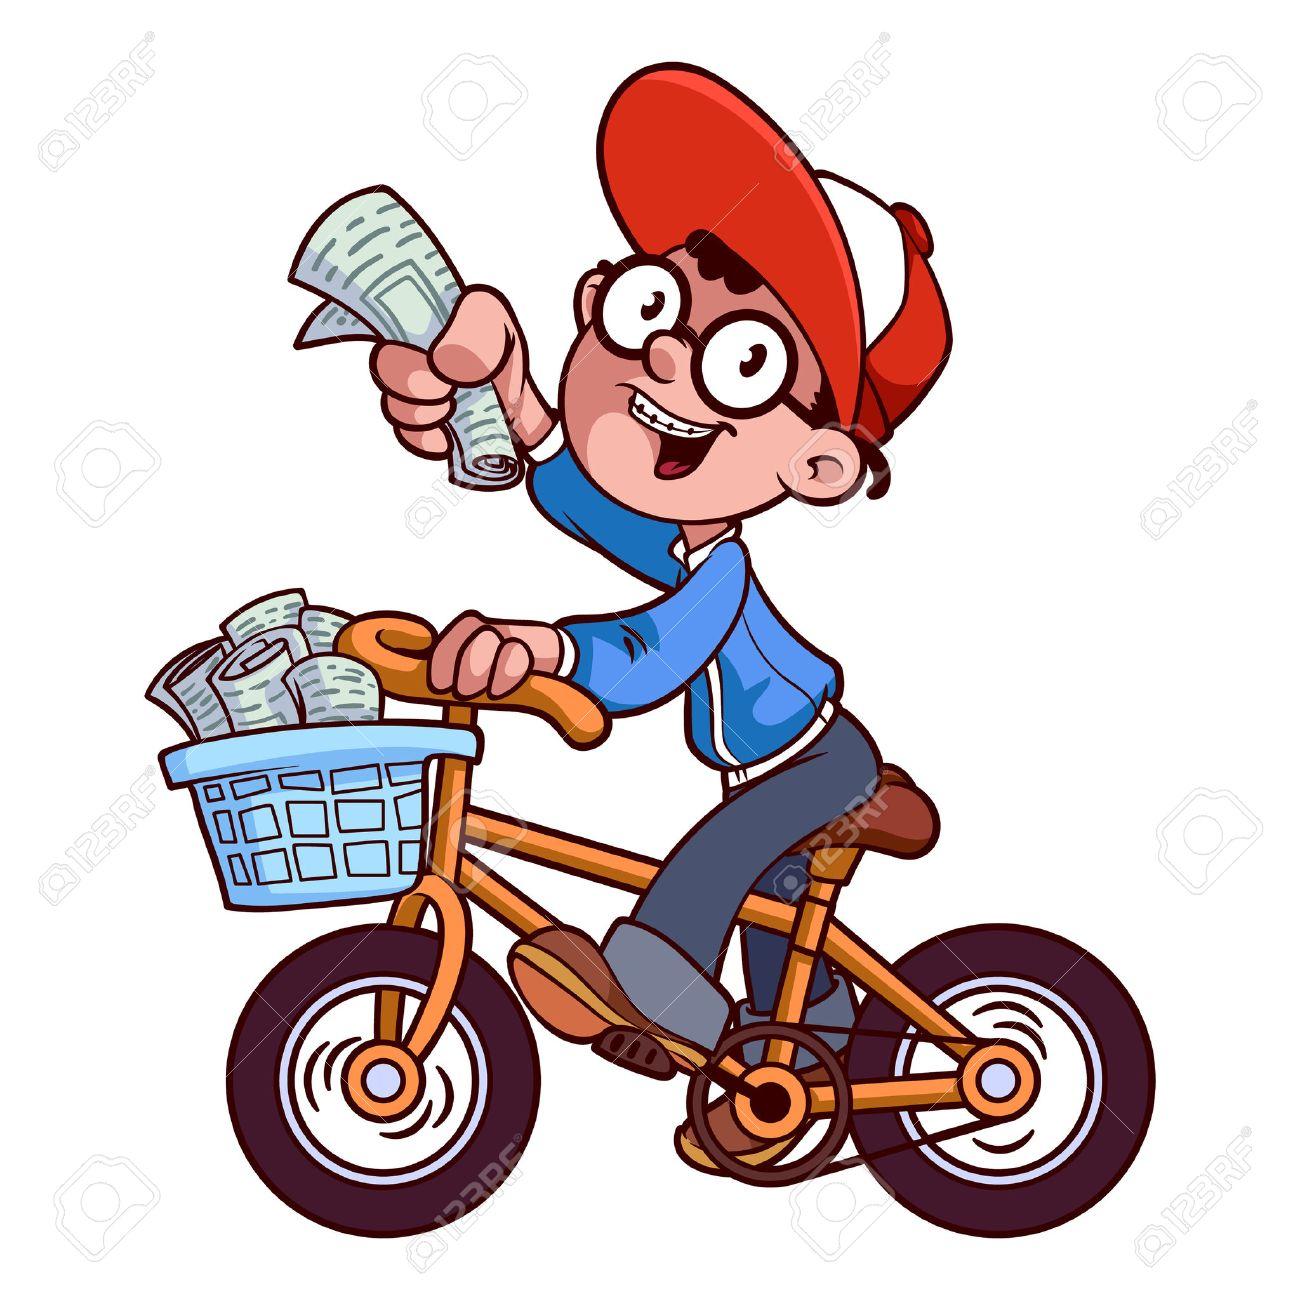 Boy Mail Messenger Cartoon Stock Photo - Image: 33226220